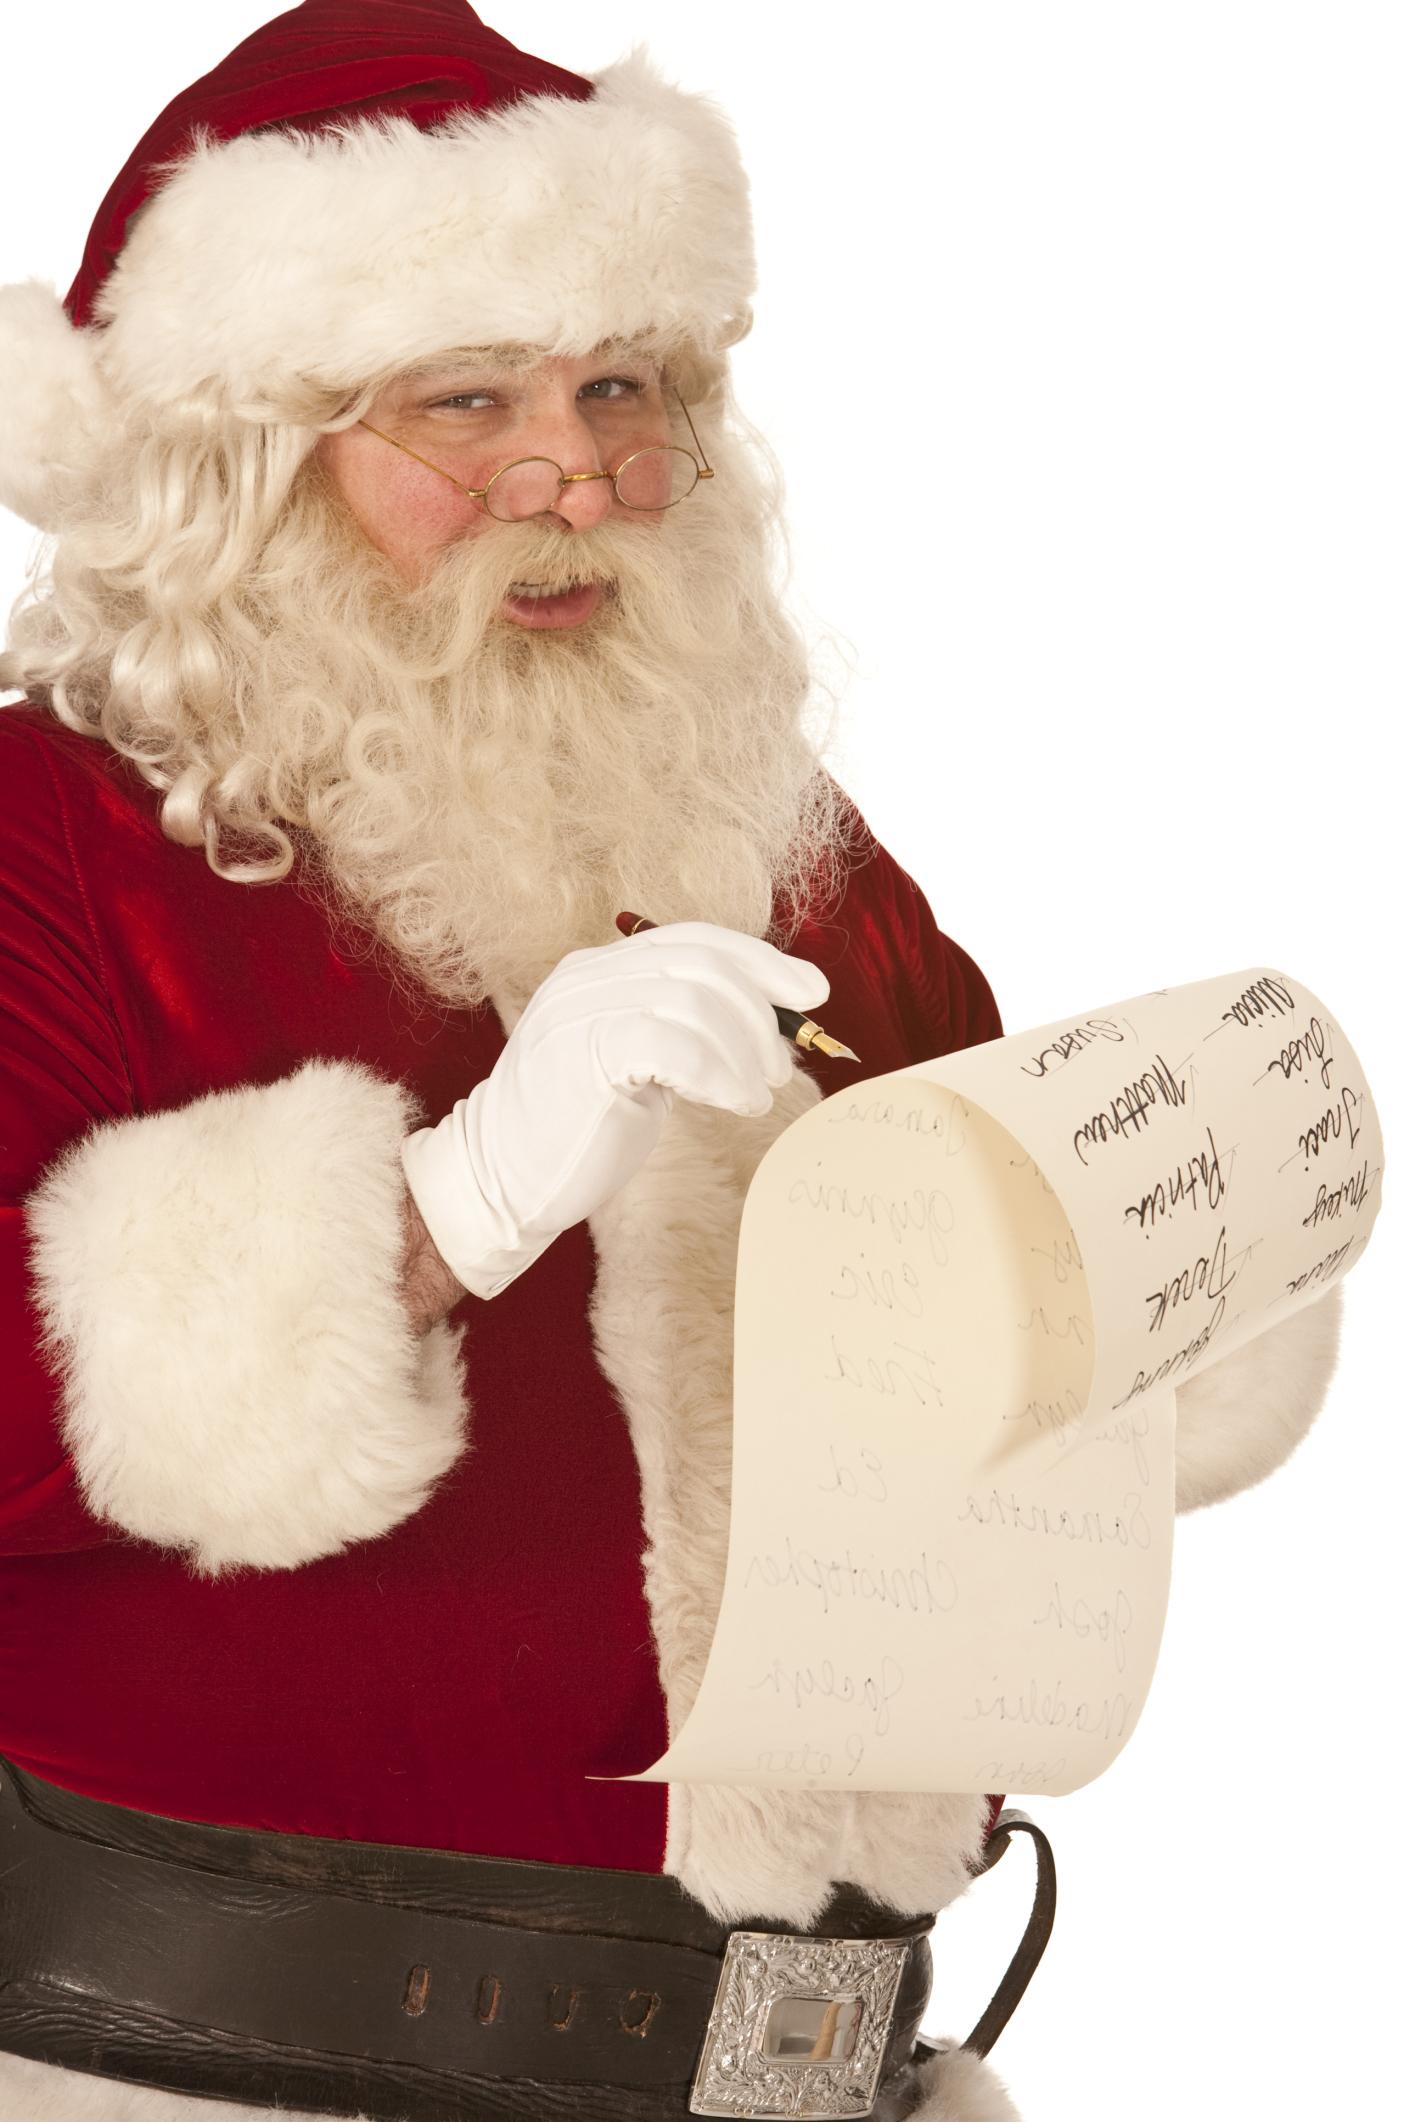 Grownup Girlz Camp Blog – Dear Santa…